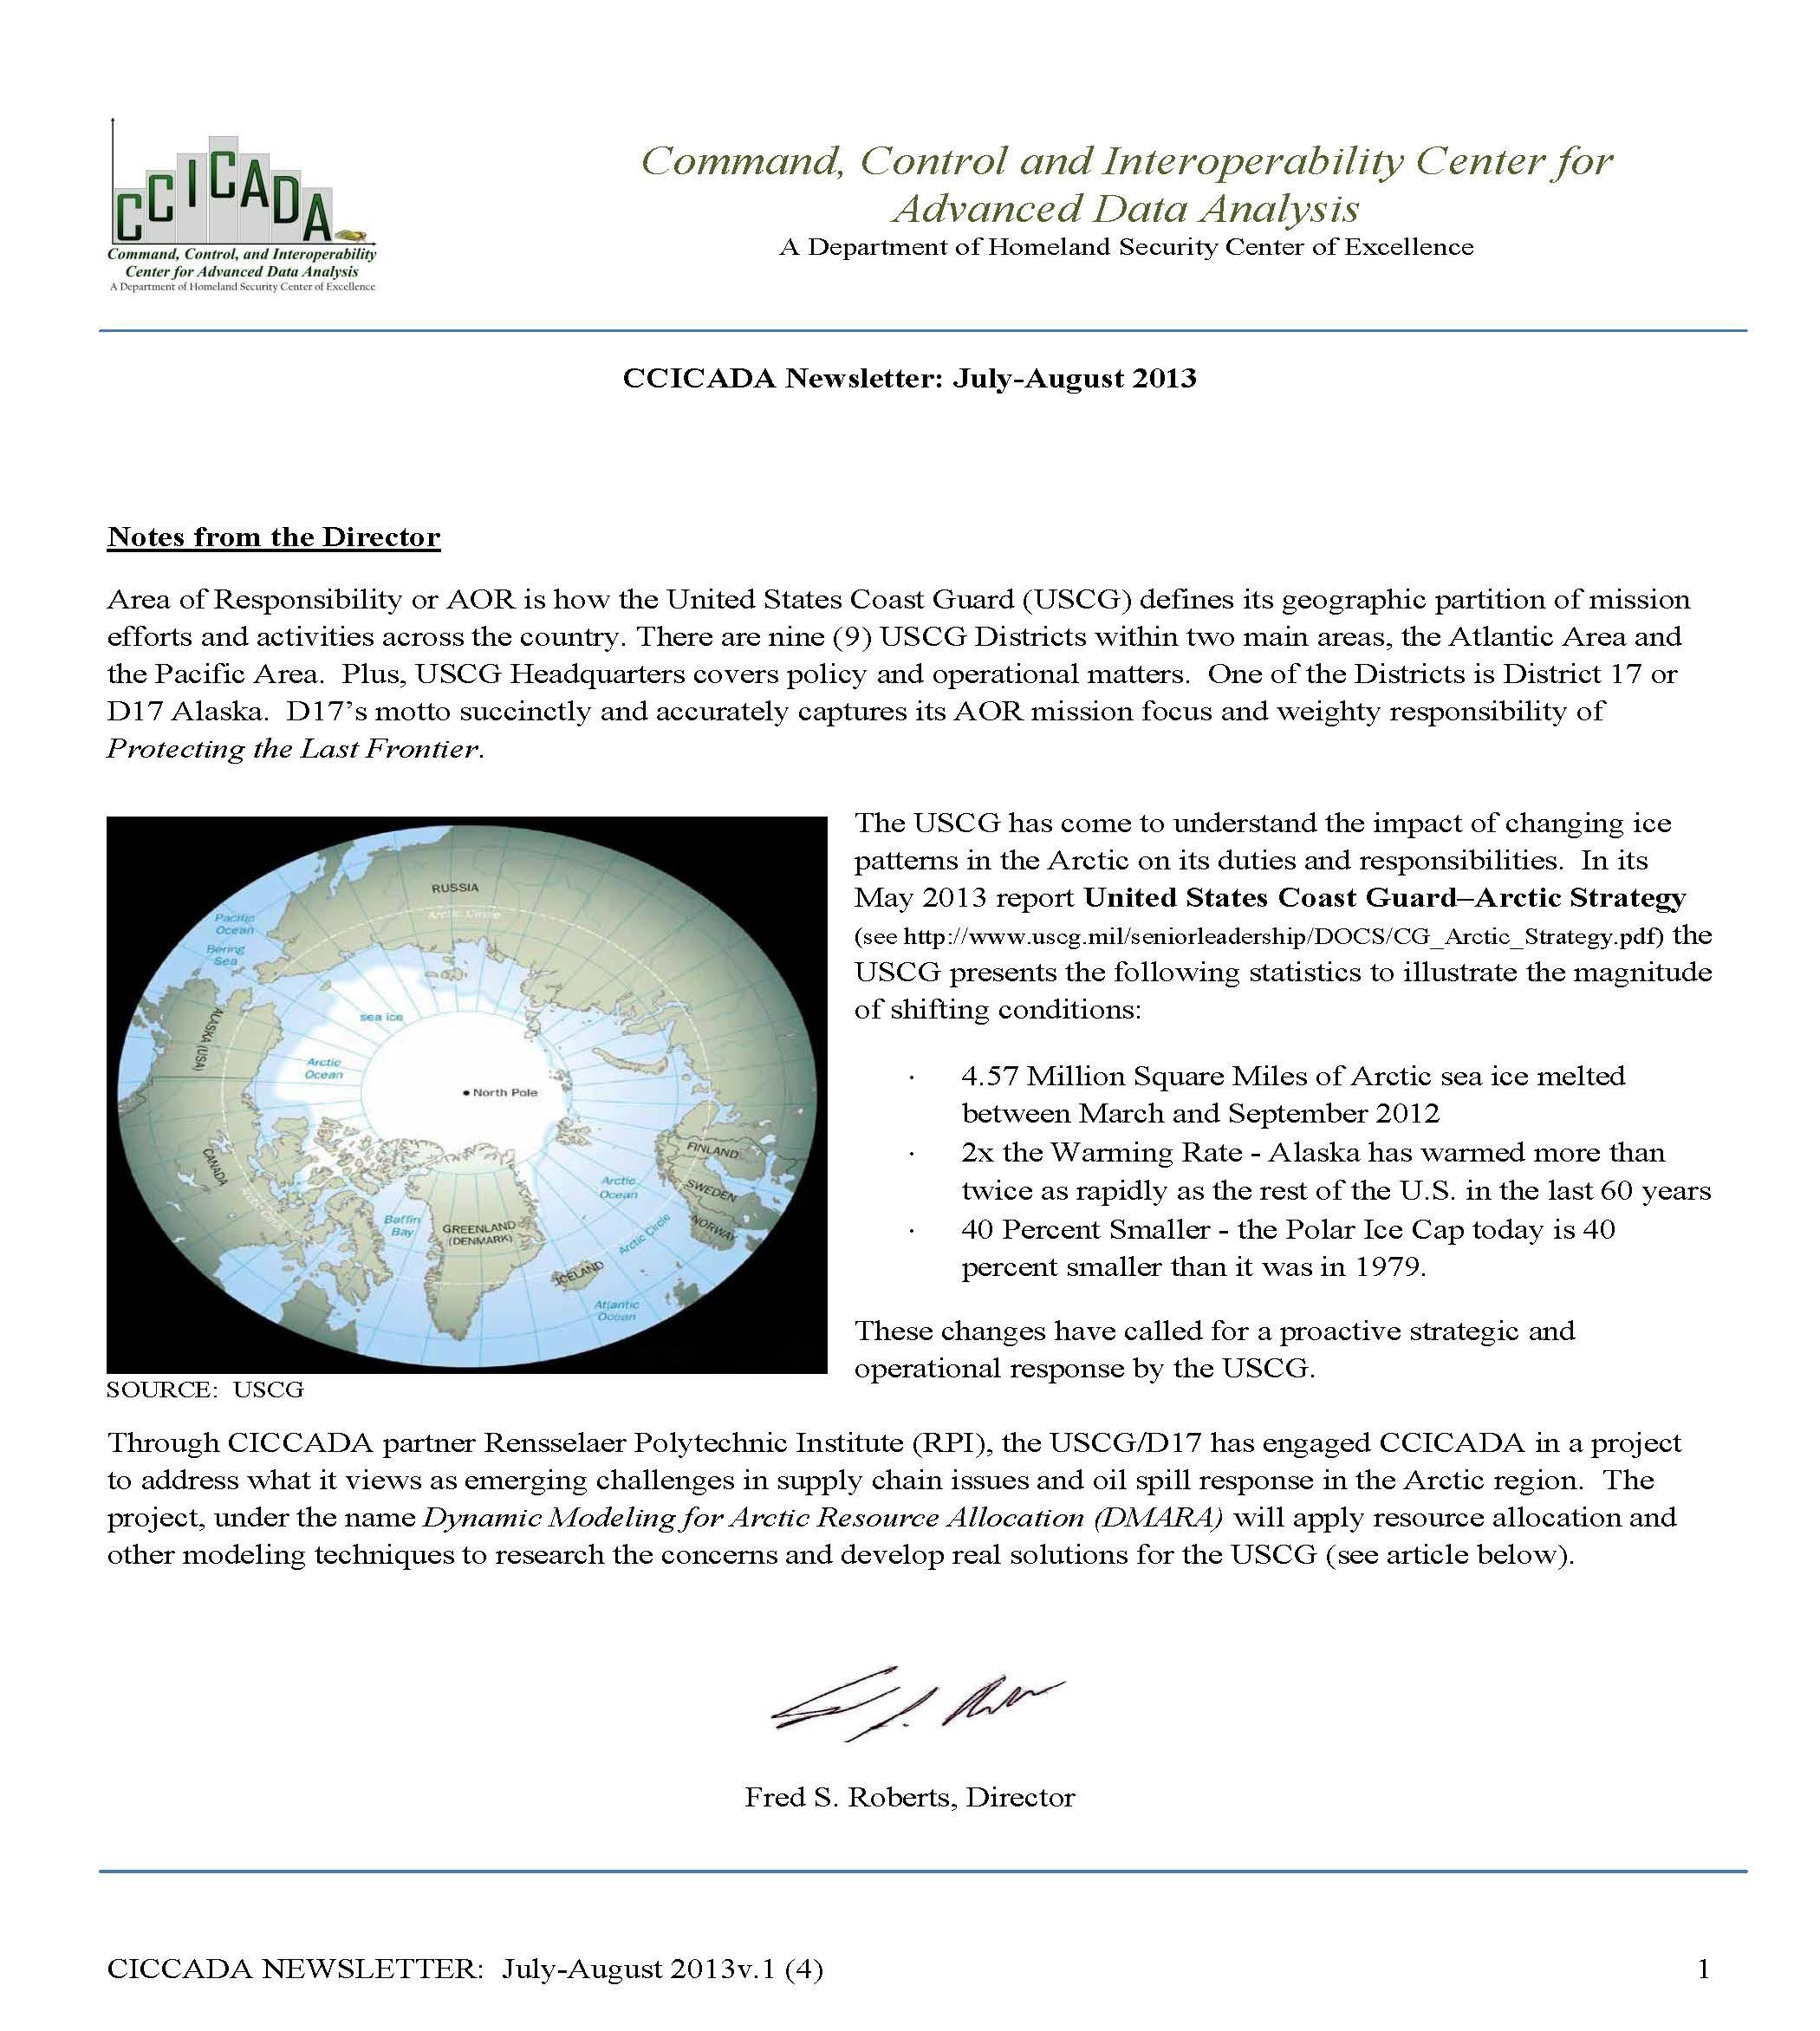 CCICADANewsletterv1No4JulyAug2013_Page_1